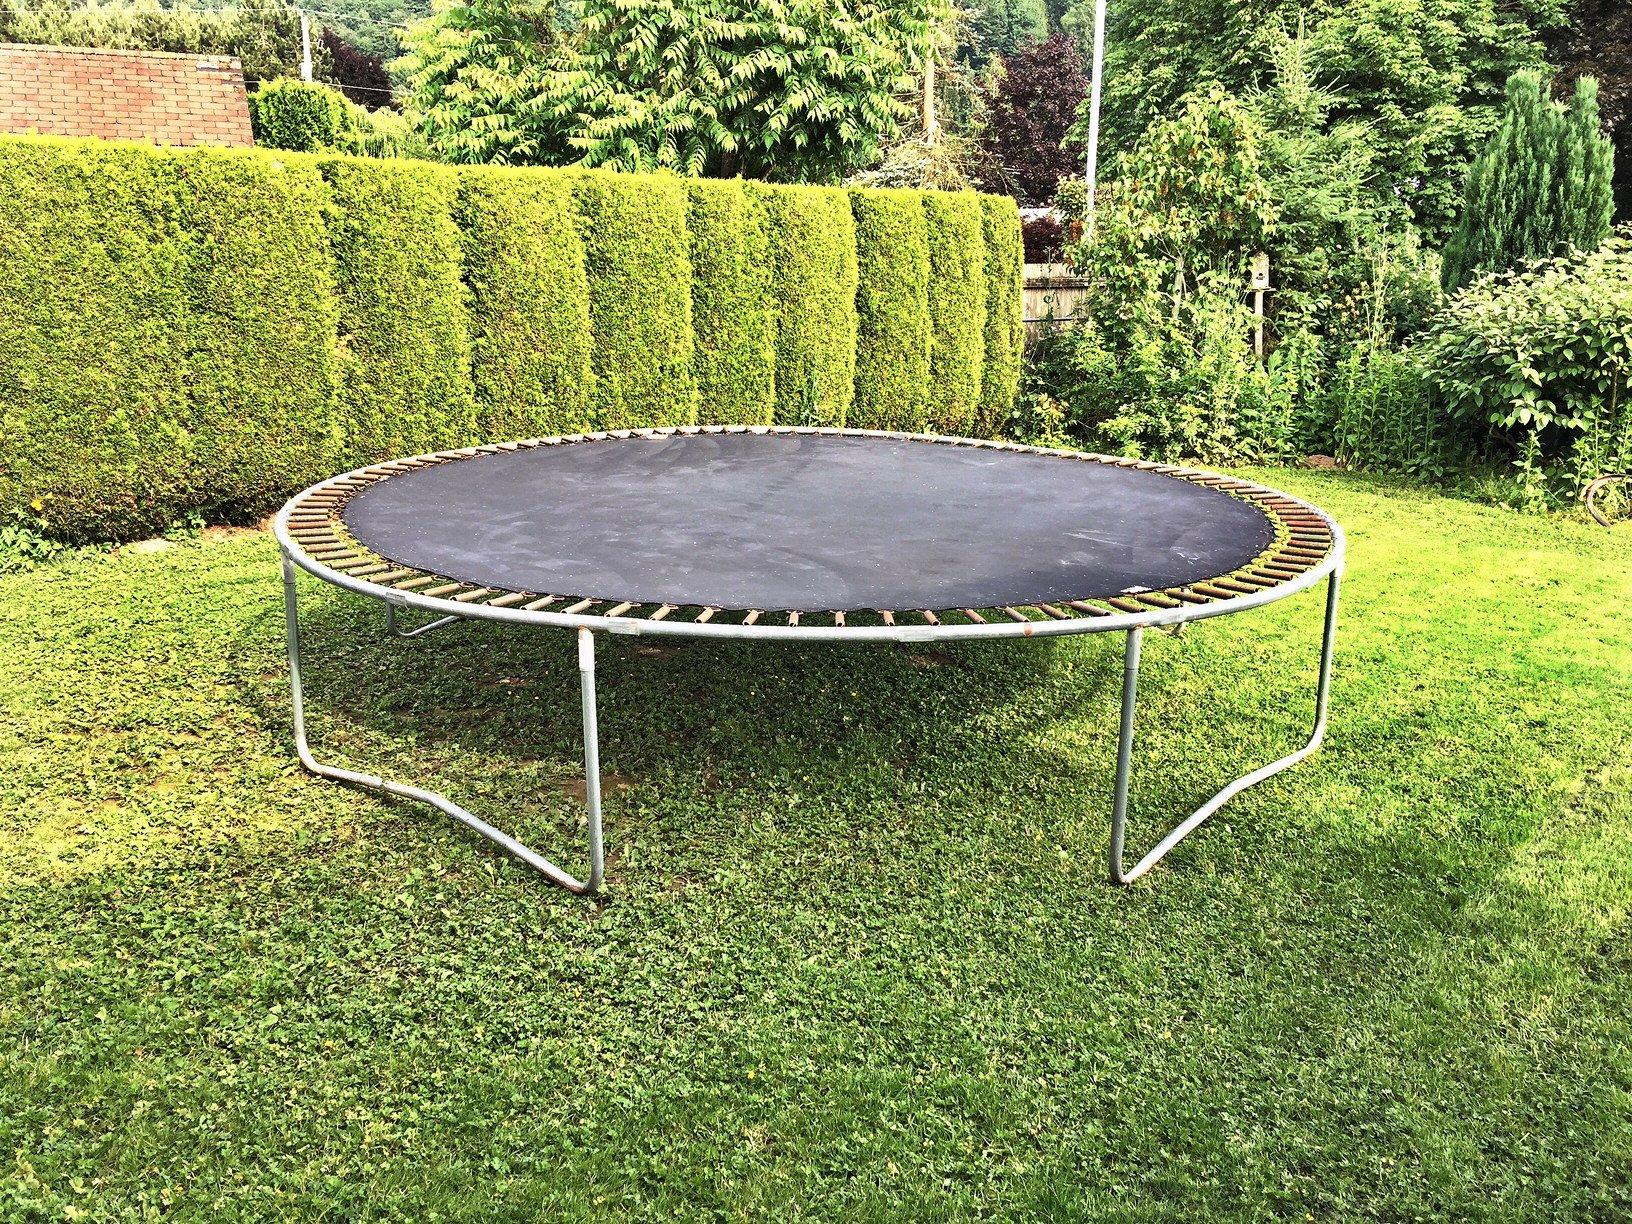 Big 'ol trampoline in a yard | funkyjunkinteriors.net